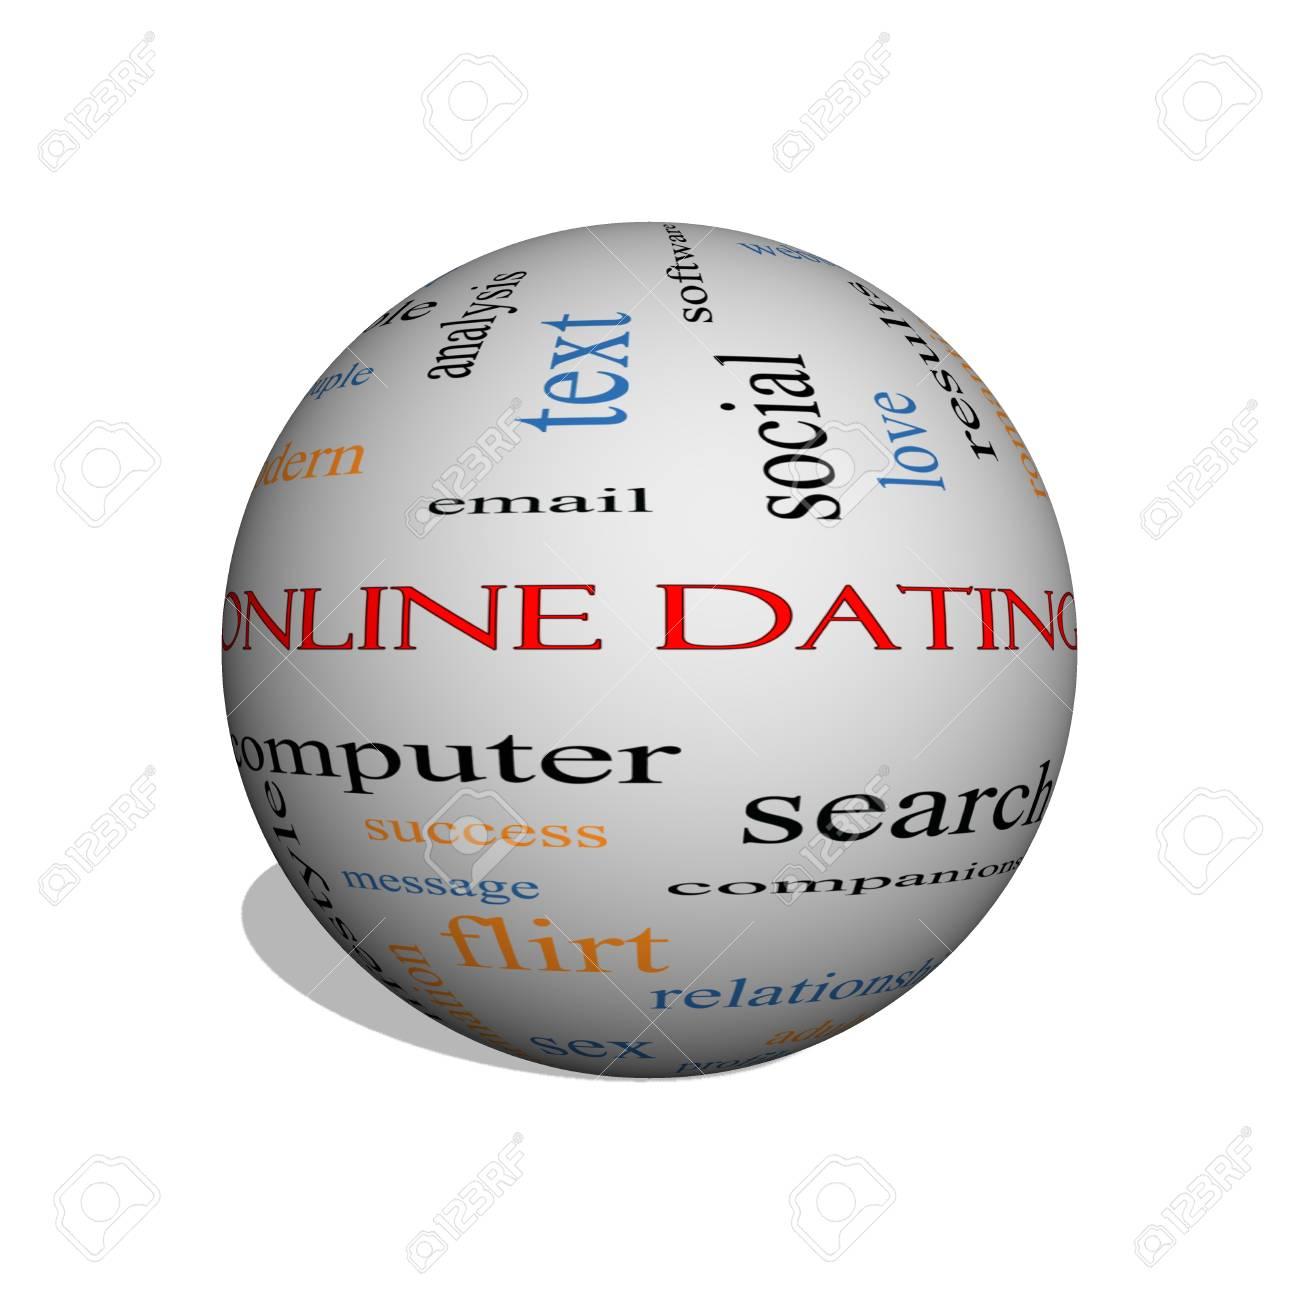 online dating wann treffen innovation speed dating